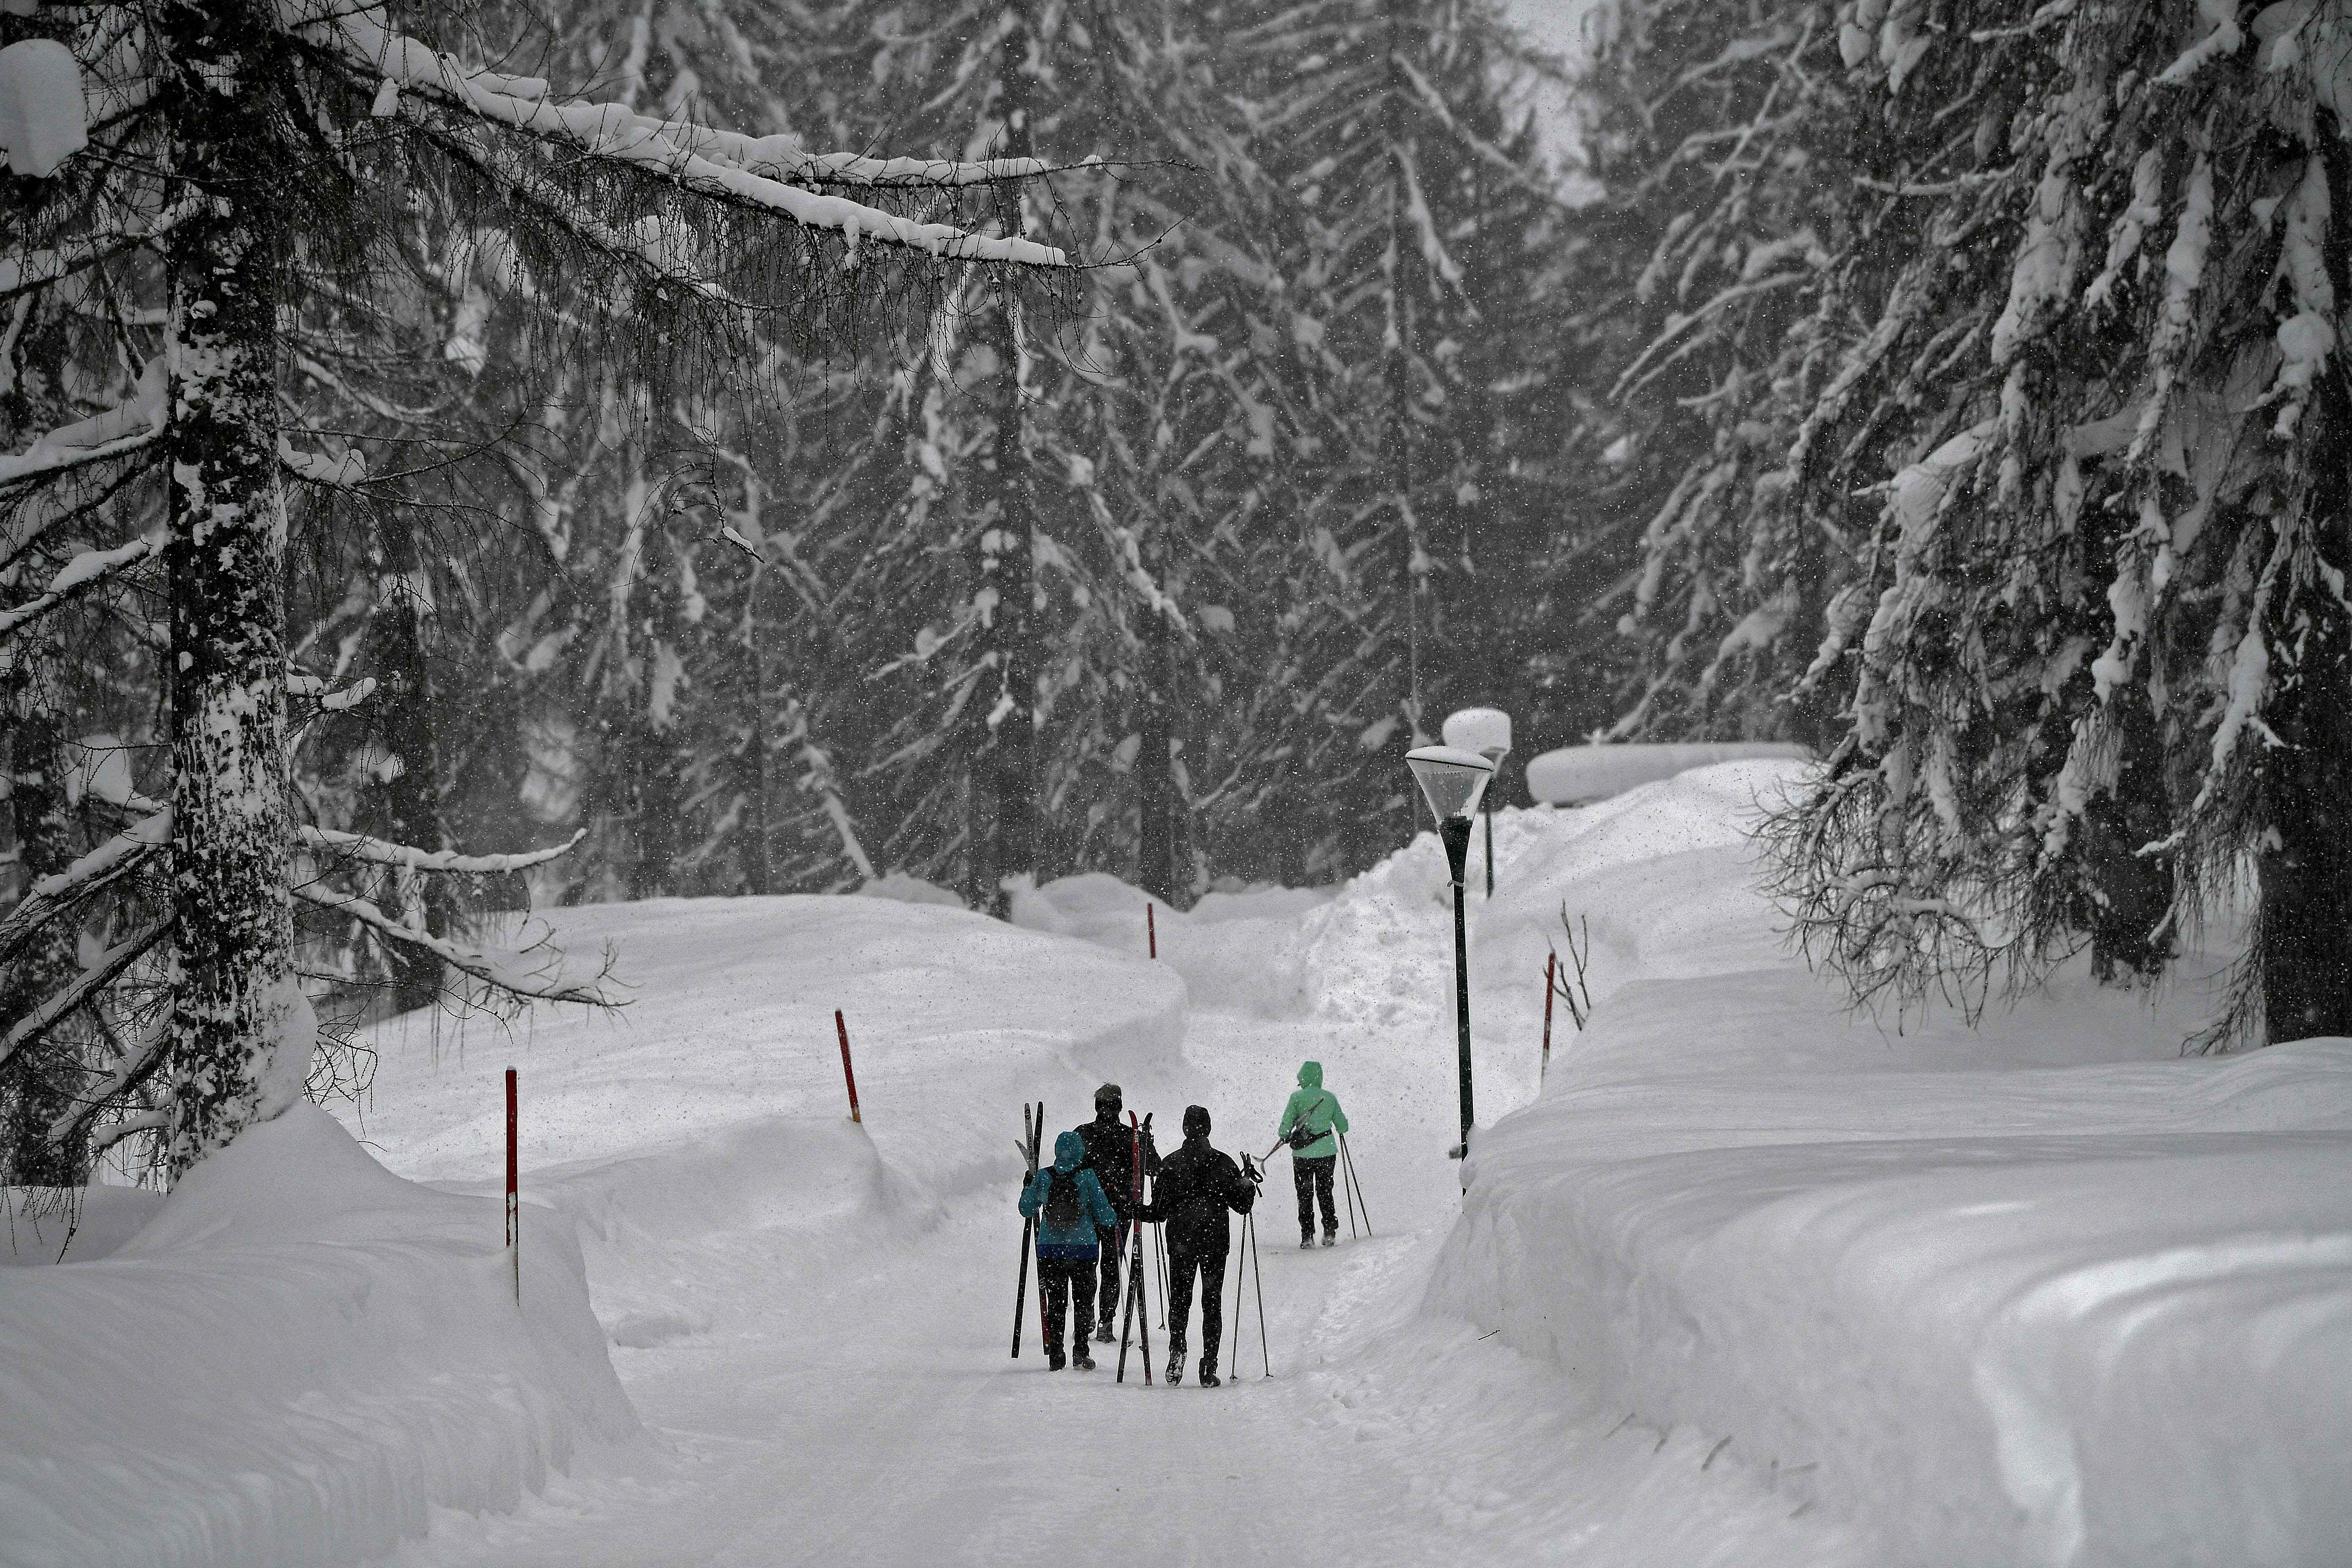 World-class climbers Jess Roskelley, David Lama and Hansjörg